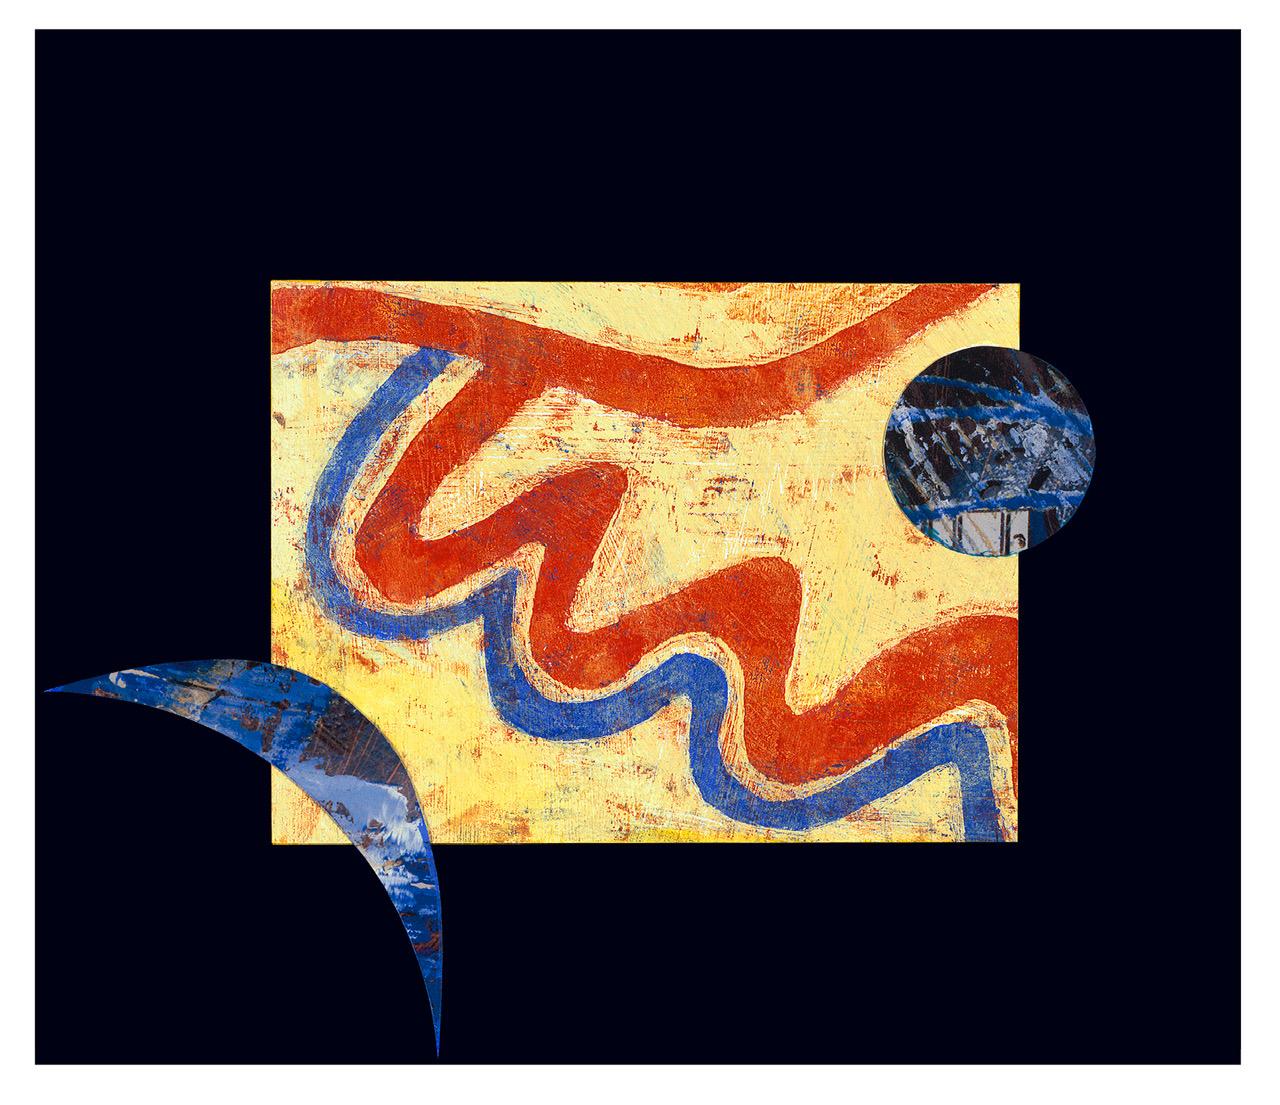 Maria Gwynne - Kandinsky series #7